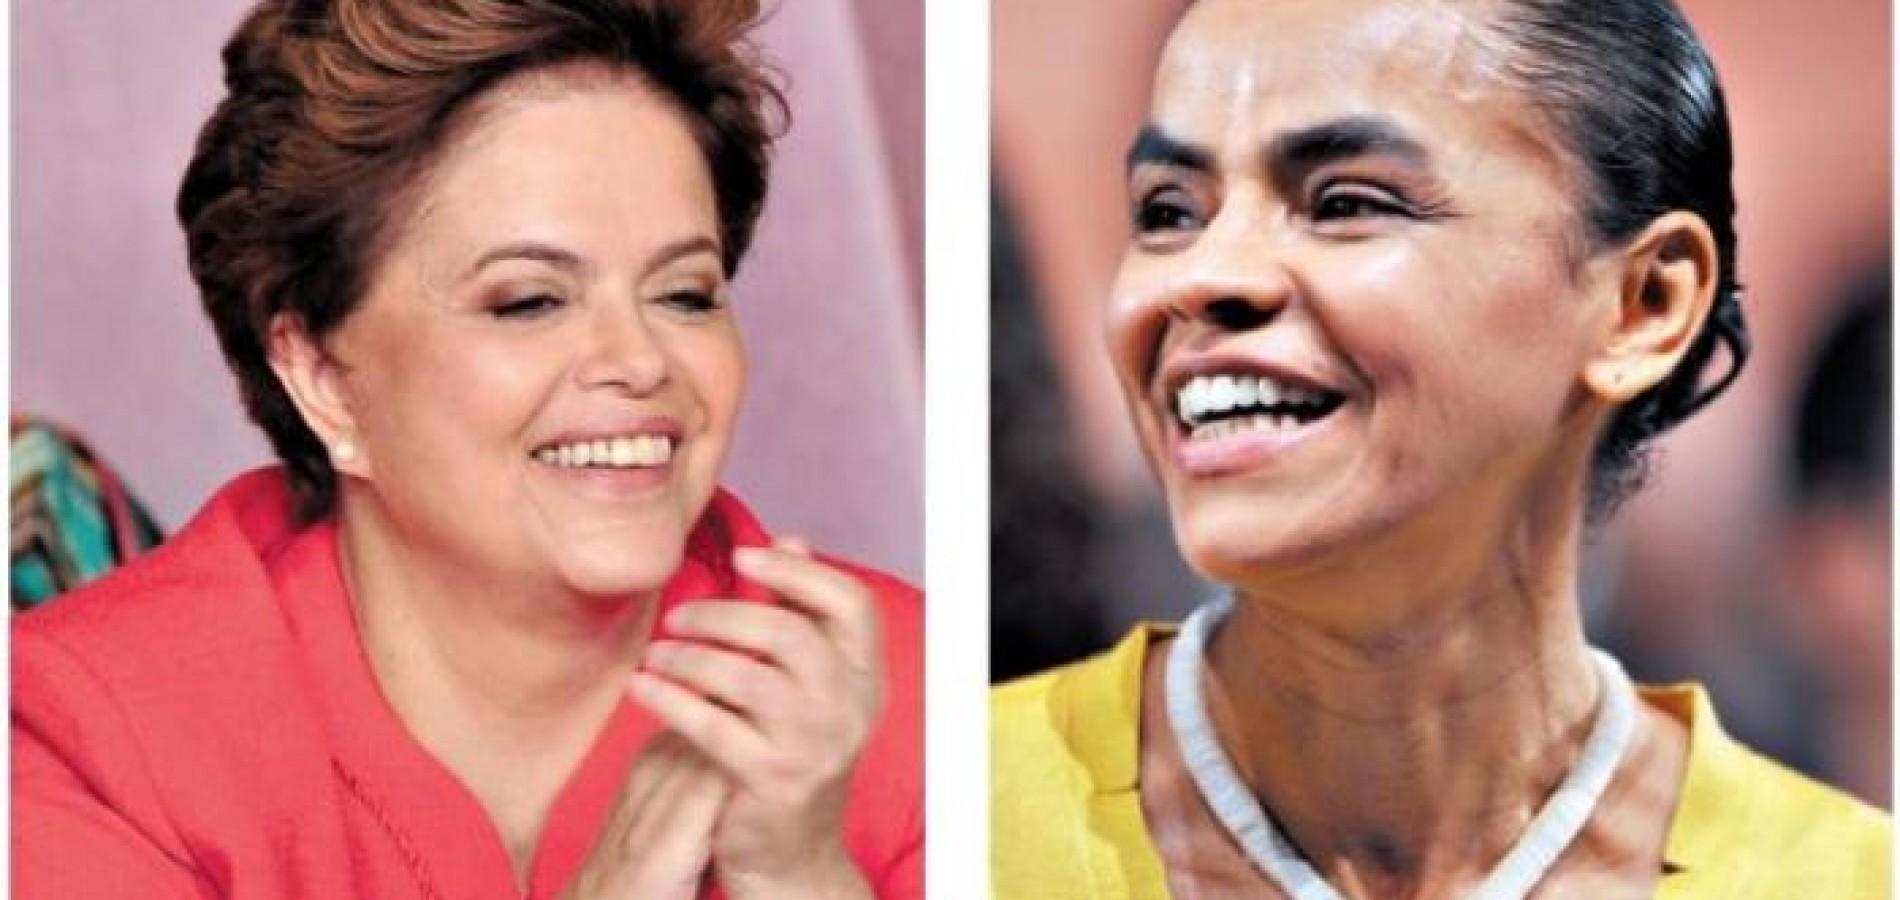 Dilma vai a 58% e Marina cai para 25% no Piauí